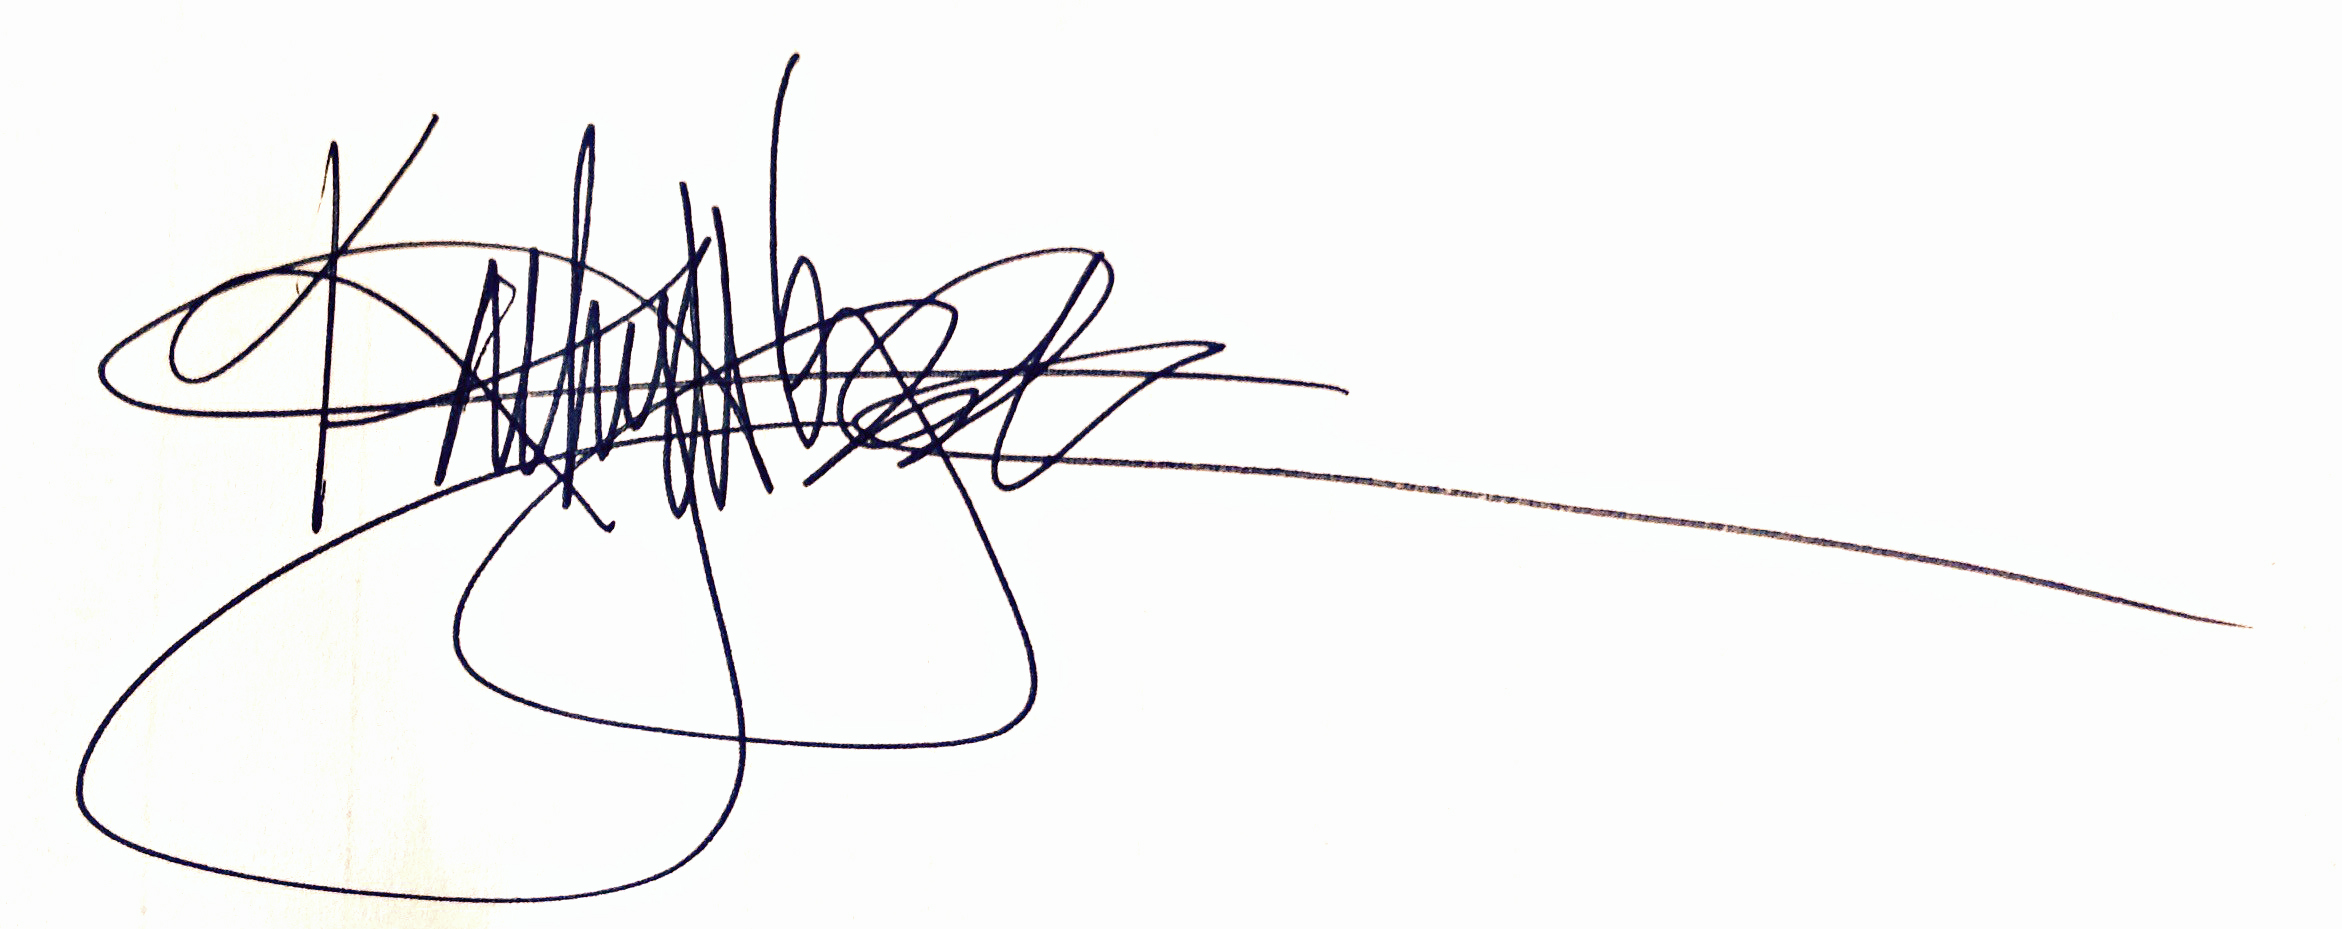 kathy tyndall's Signature